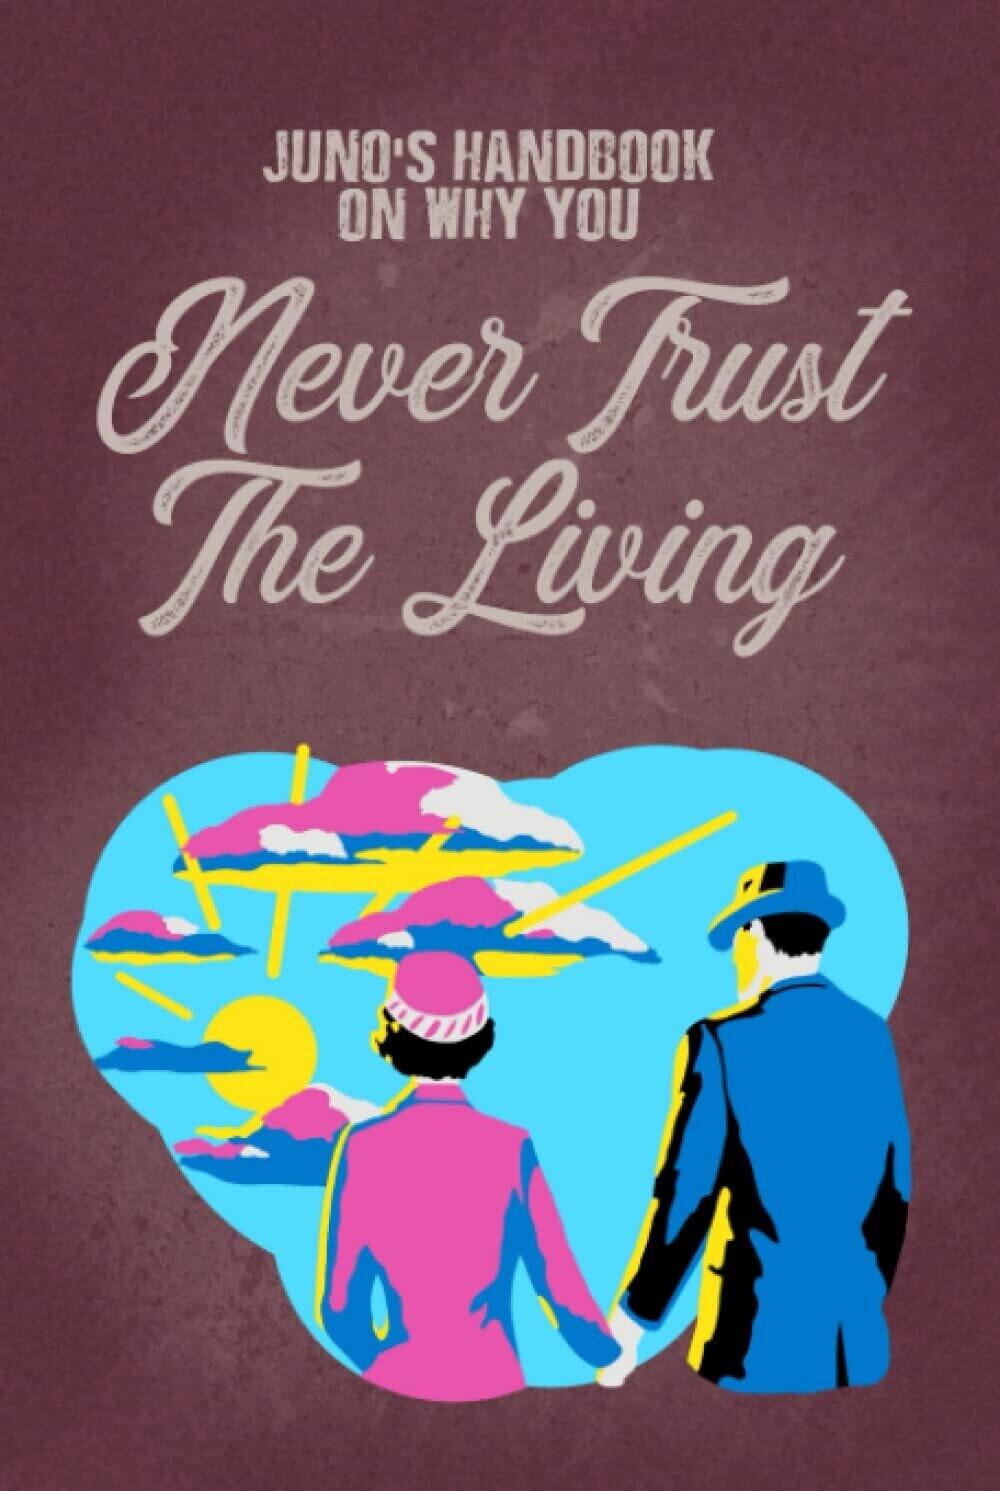 Juno's Handbook on why you Never Trust the Living [Beetlejuice - Handbook for the Recently Deceased] Hardback Book